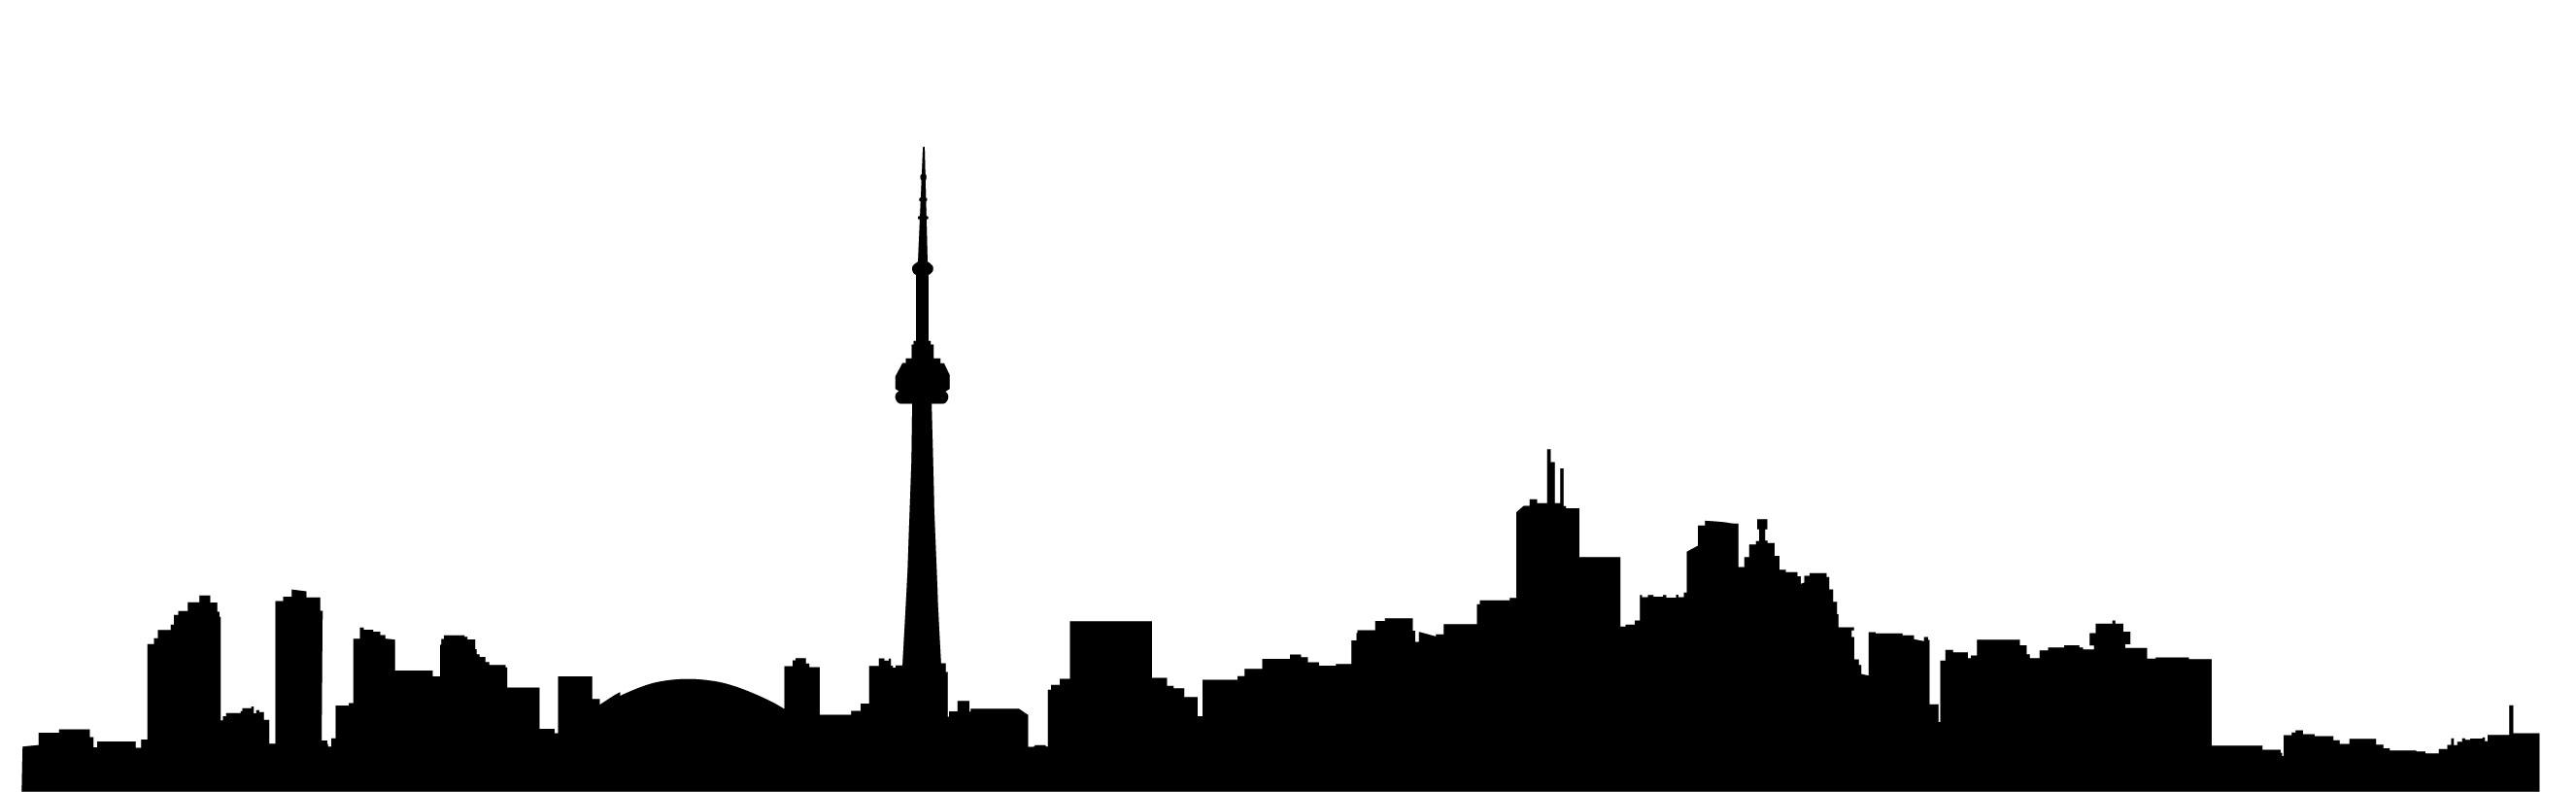 2652x815 Skyline Clipart Toronto